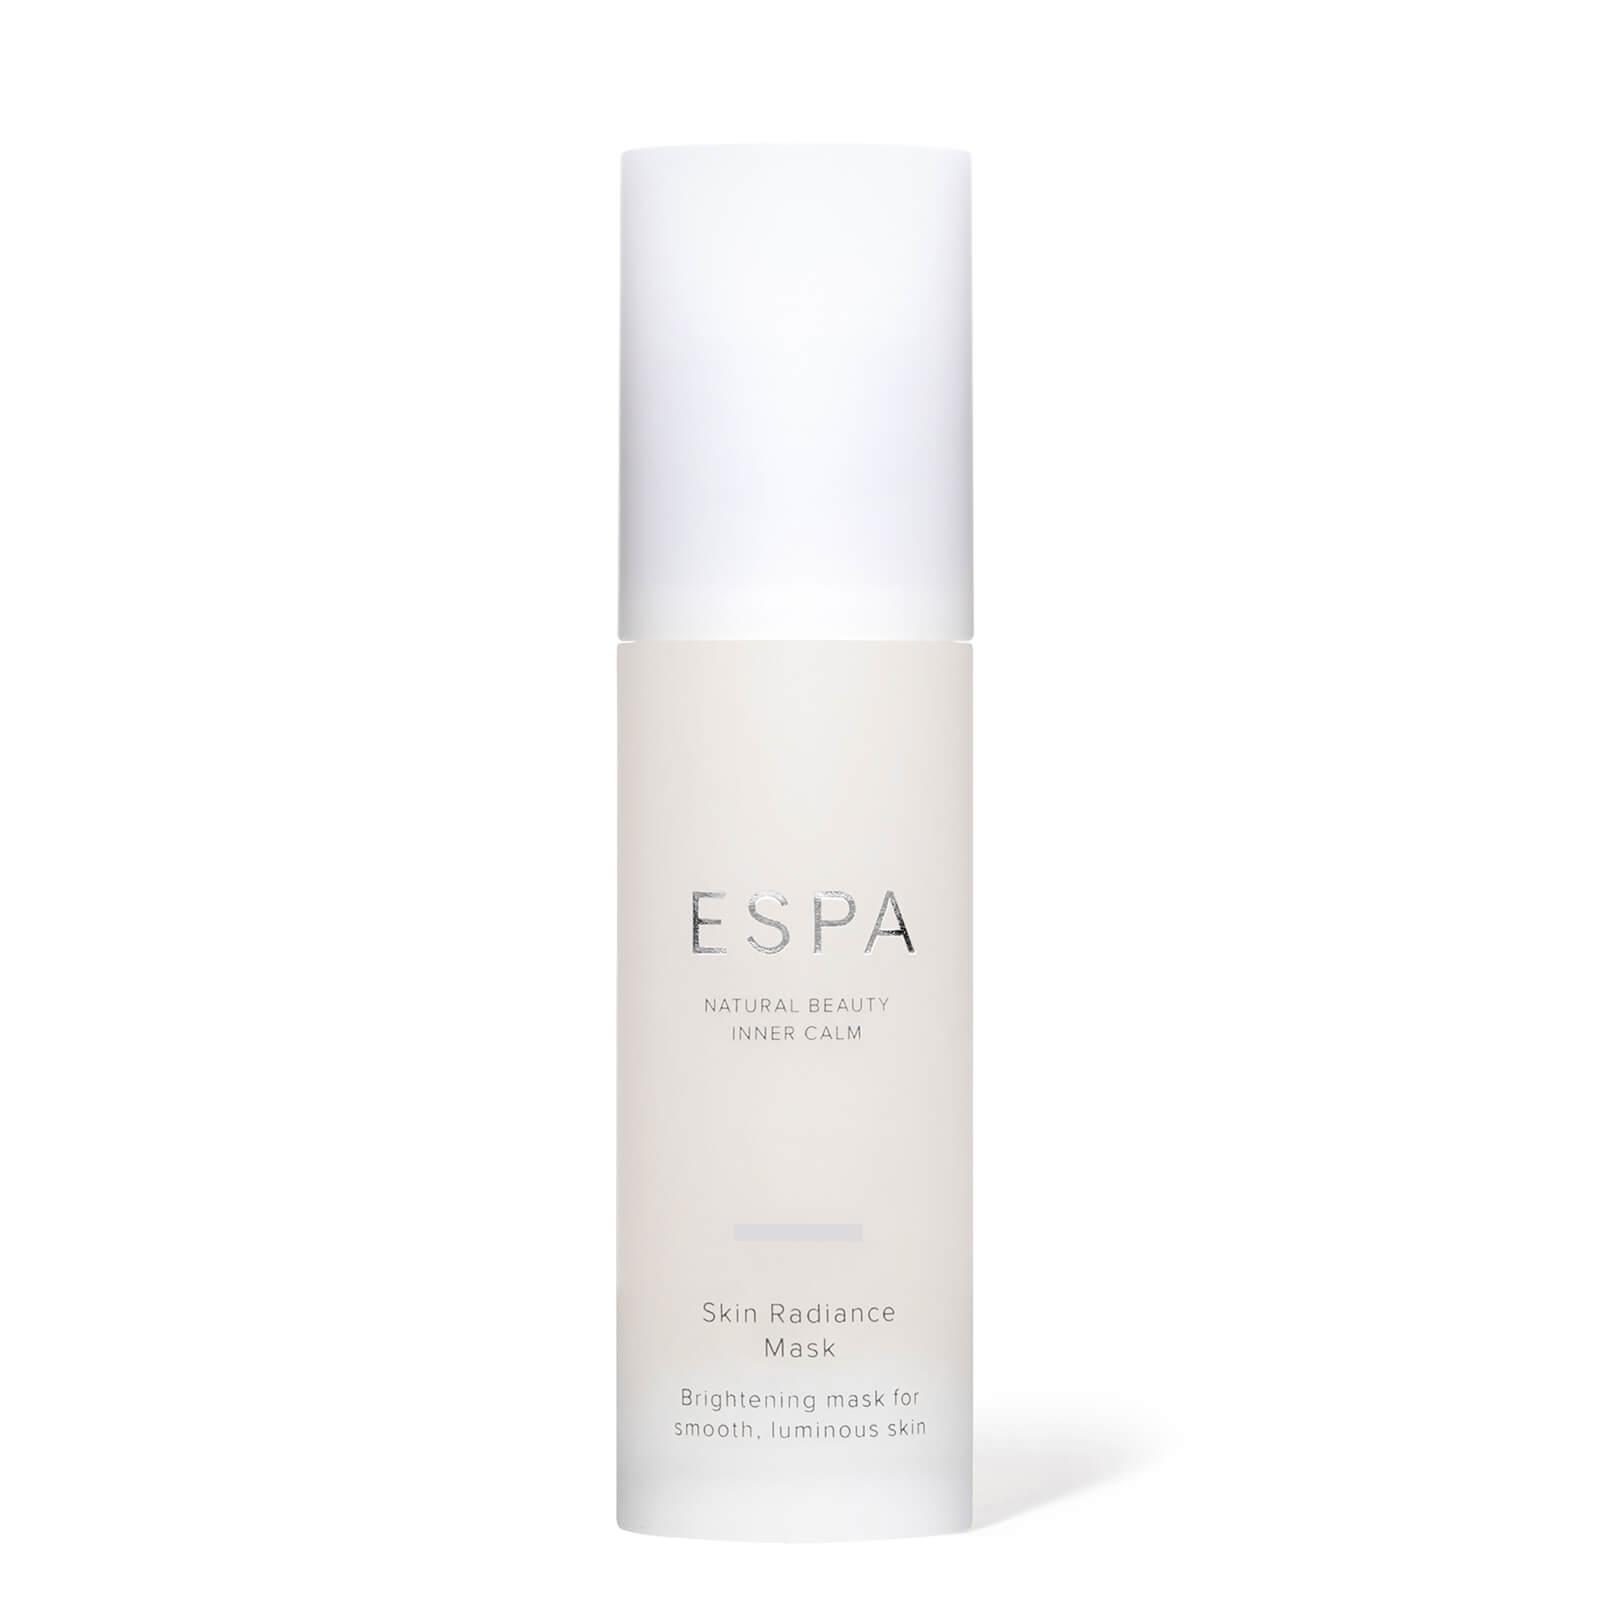 ESPA Skin Radiance Mask 35ml